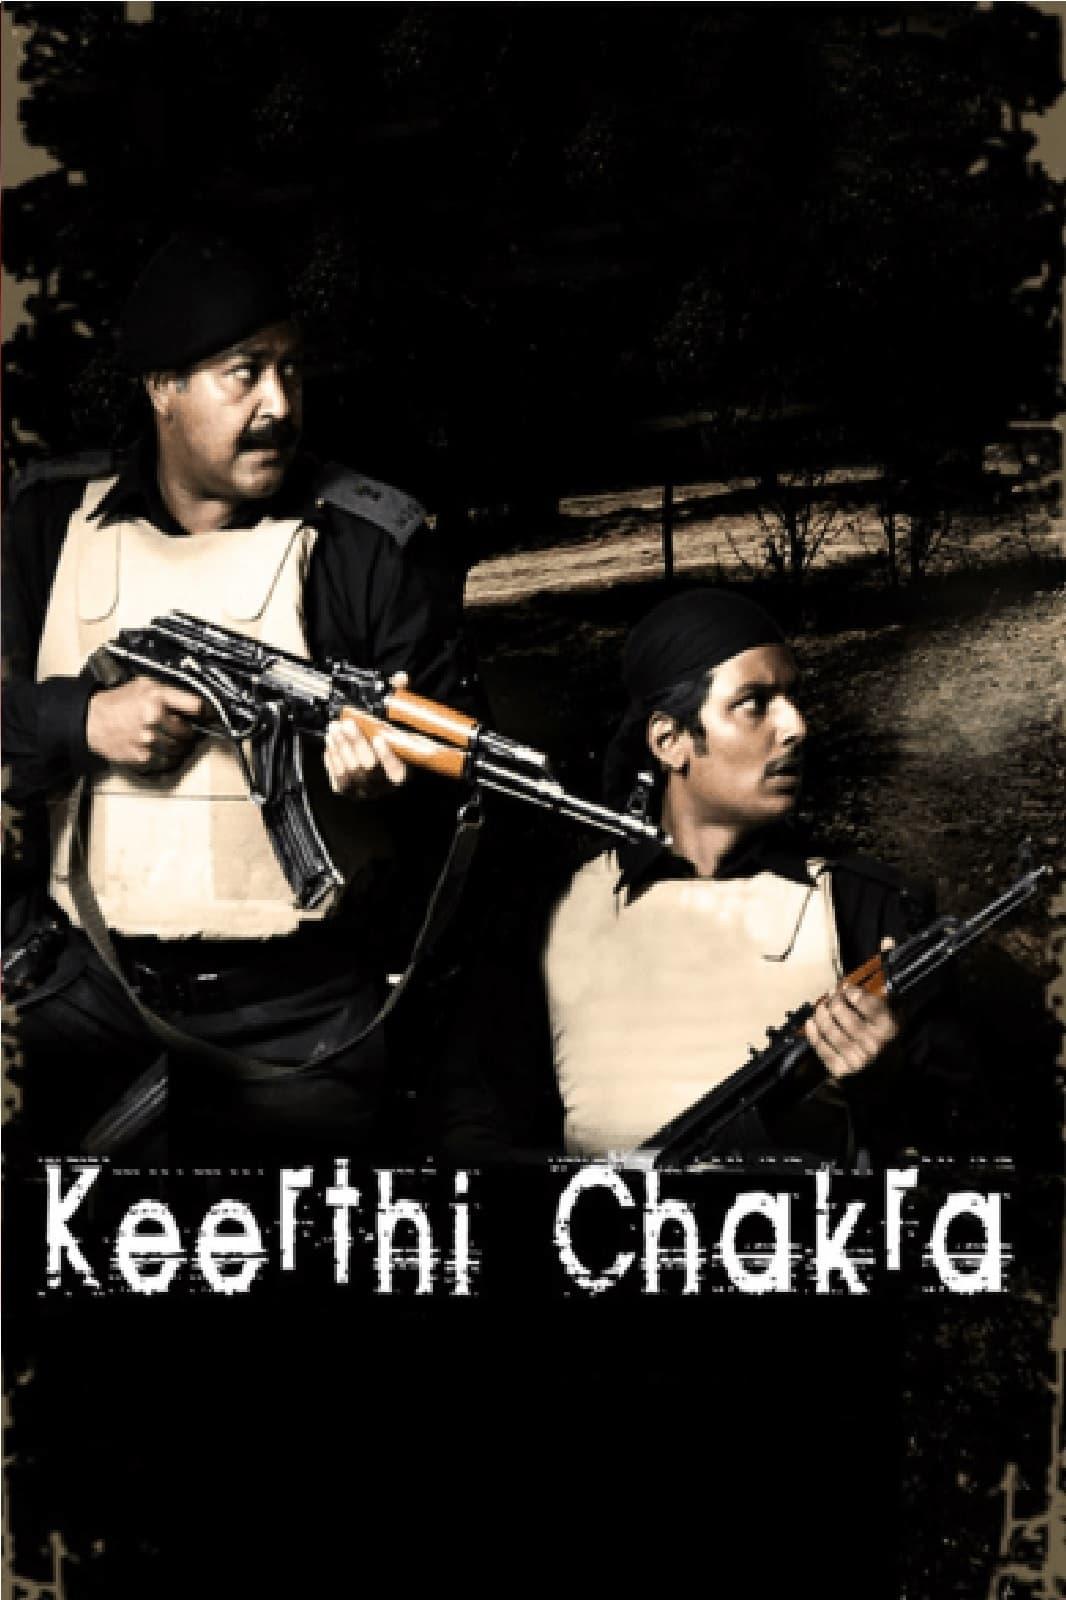 Keerthi Chakra